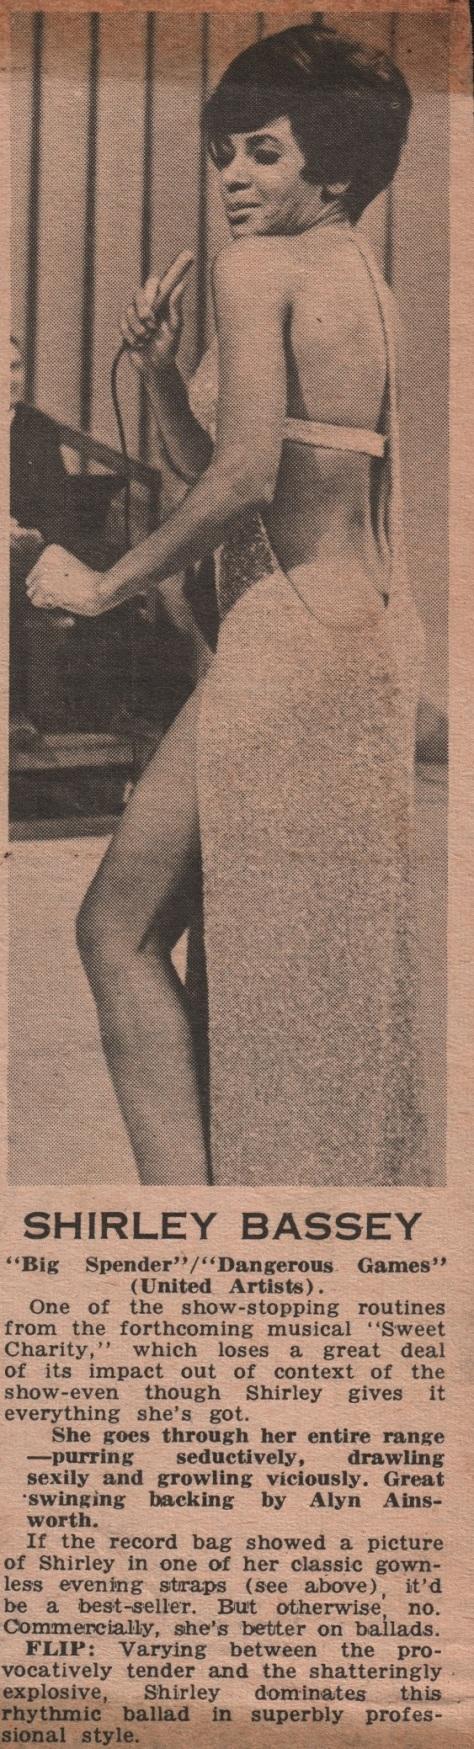 1967 AN